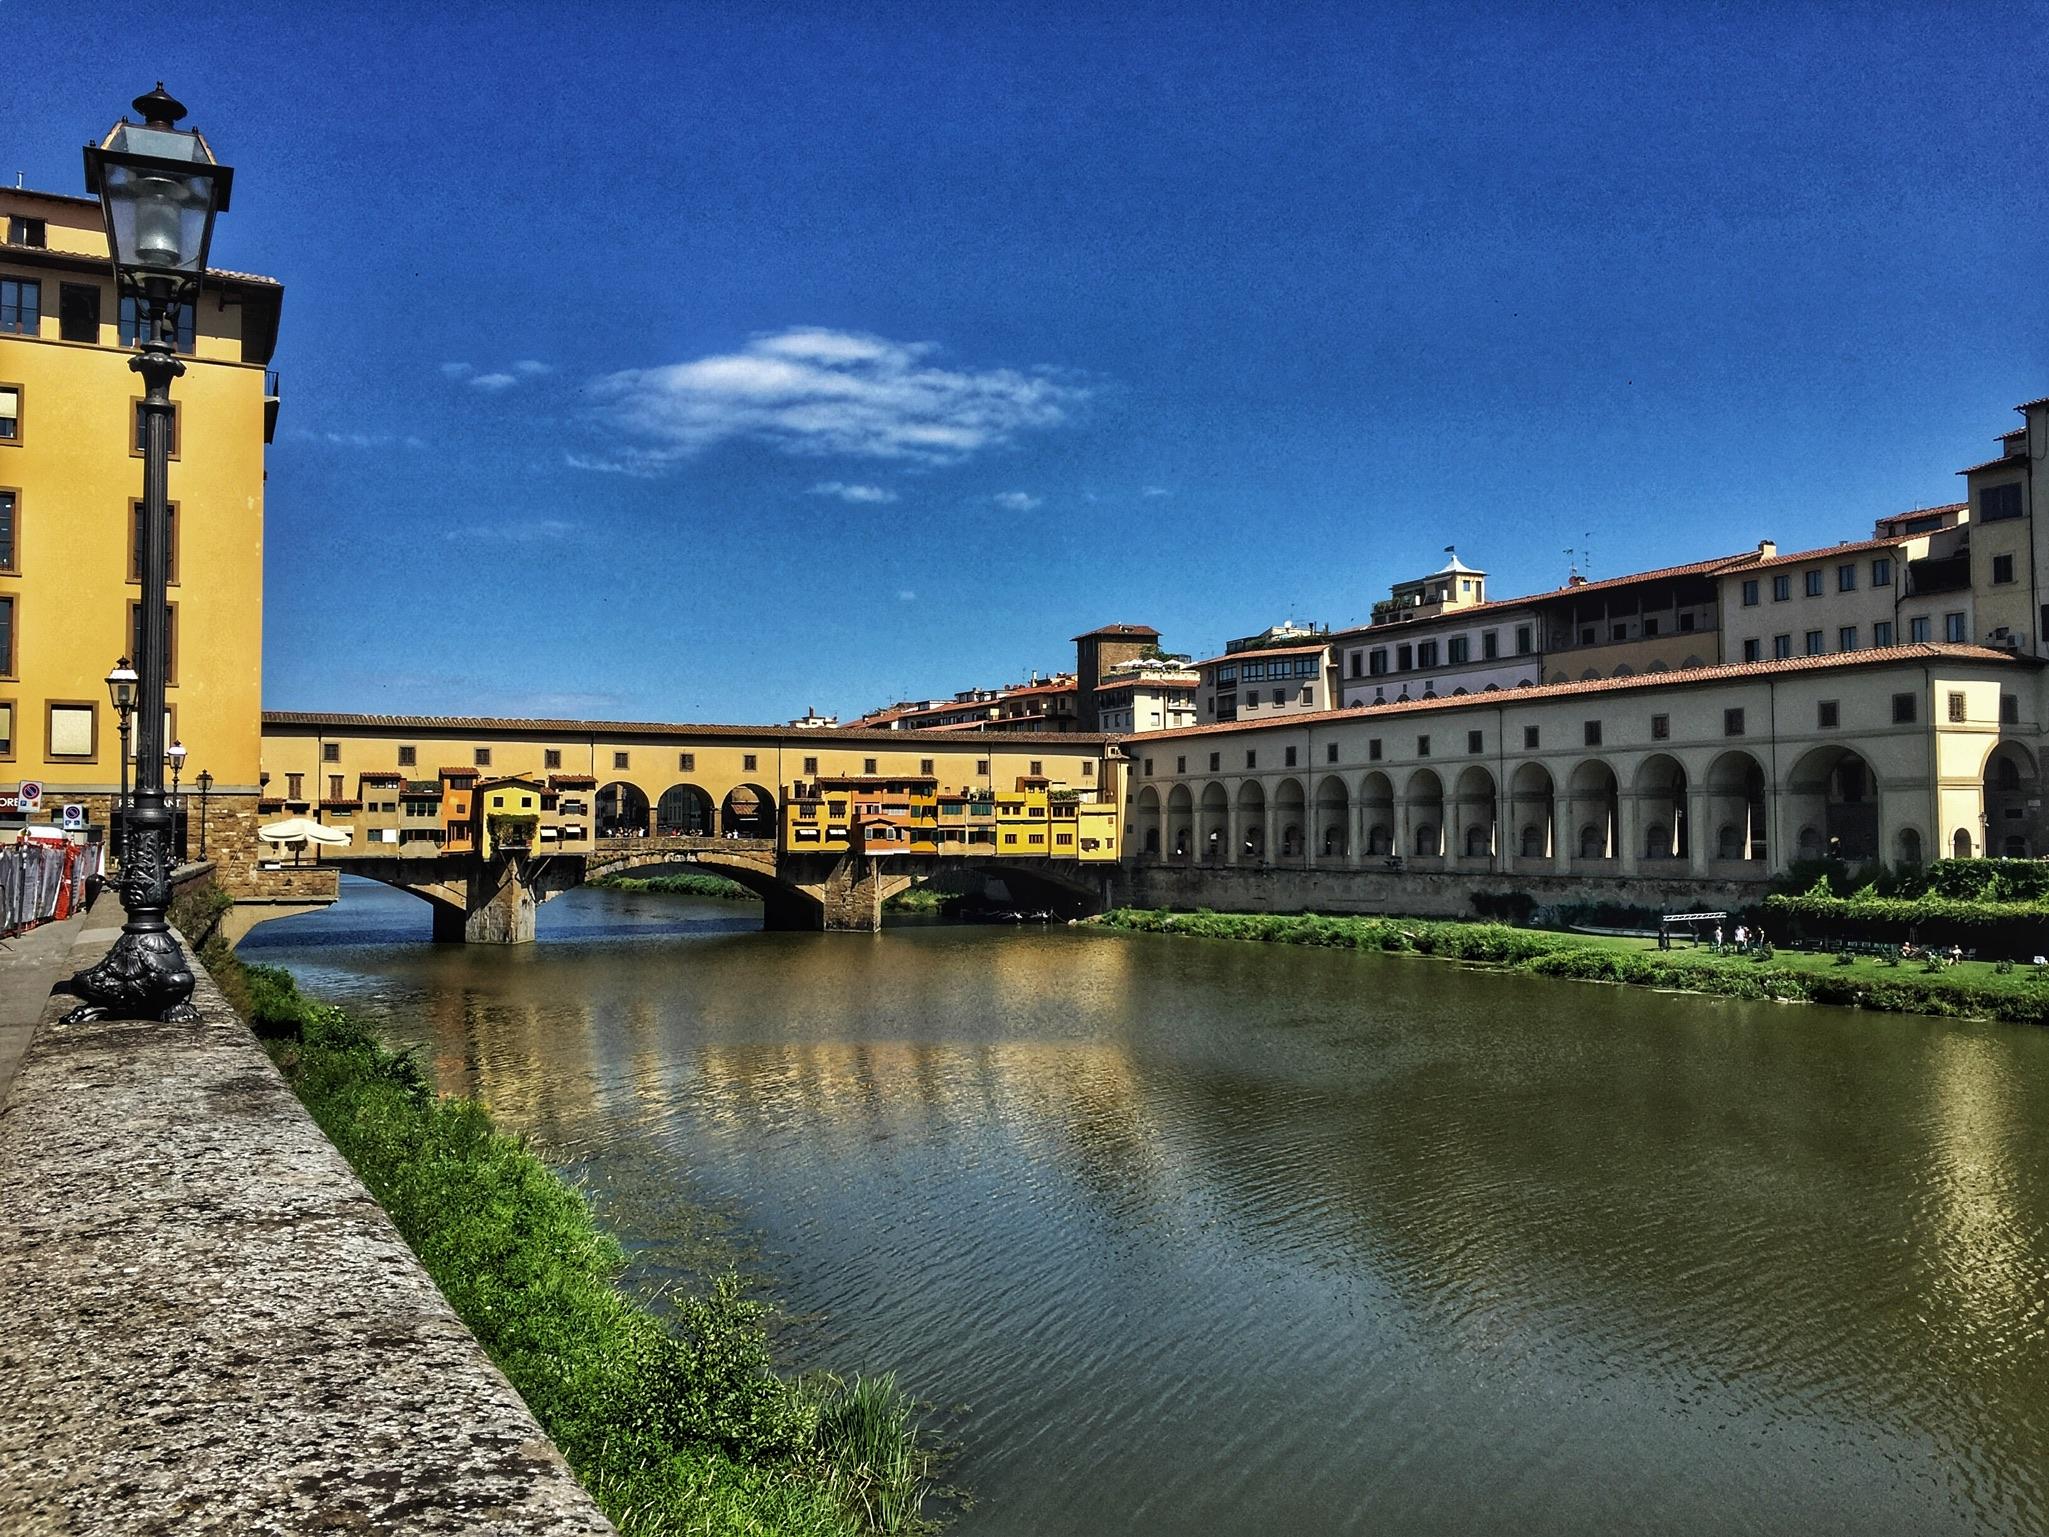 Ponte Vecchio - a peculiar bridge with apartments and shops built into it.